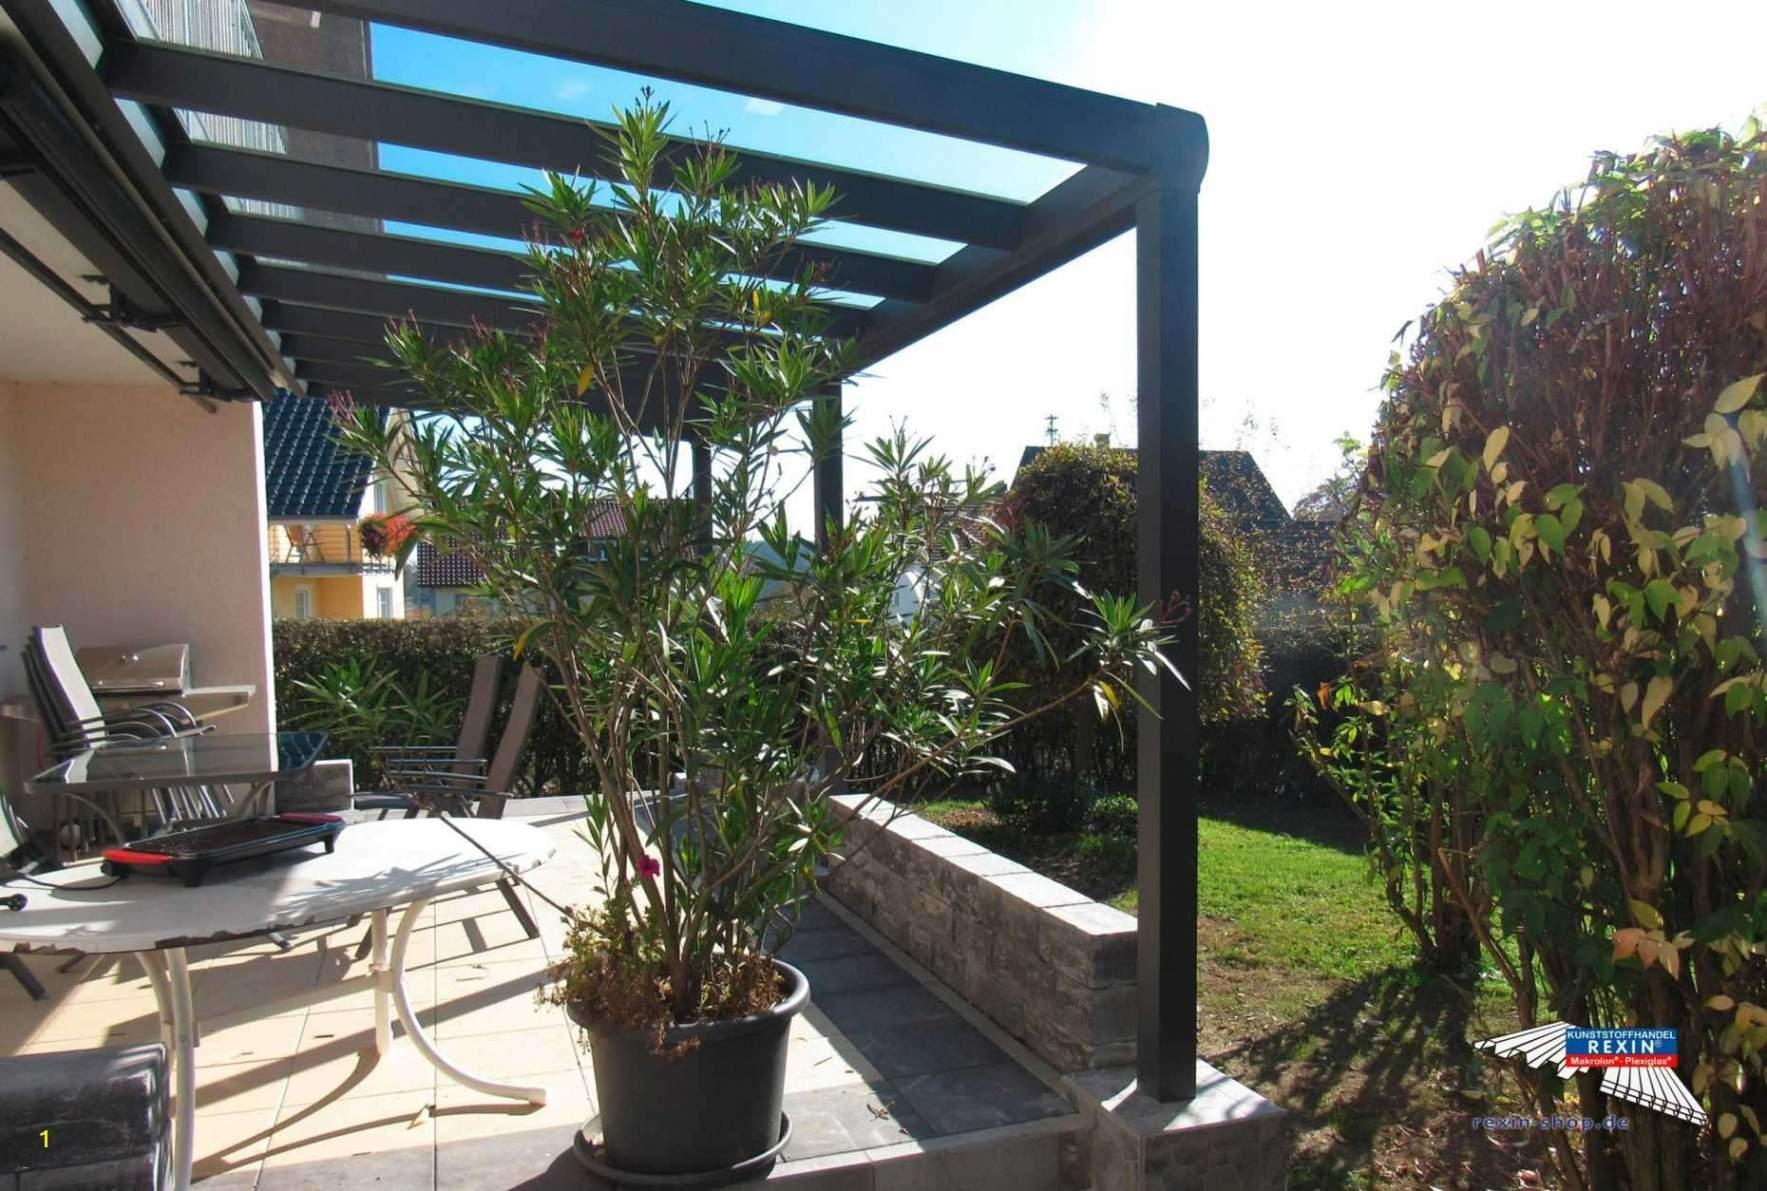 terrassen ideen bilder frisch sommer garten garten terrasse ideen terrassen ideen bilder terrassen ideen bilder